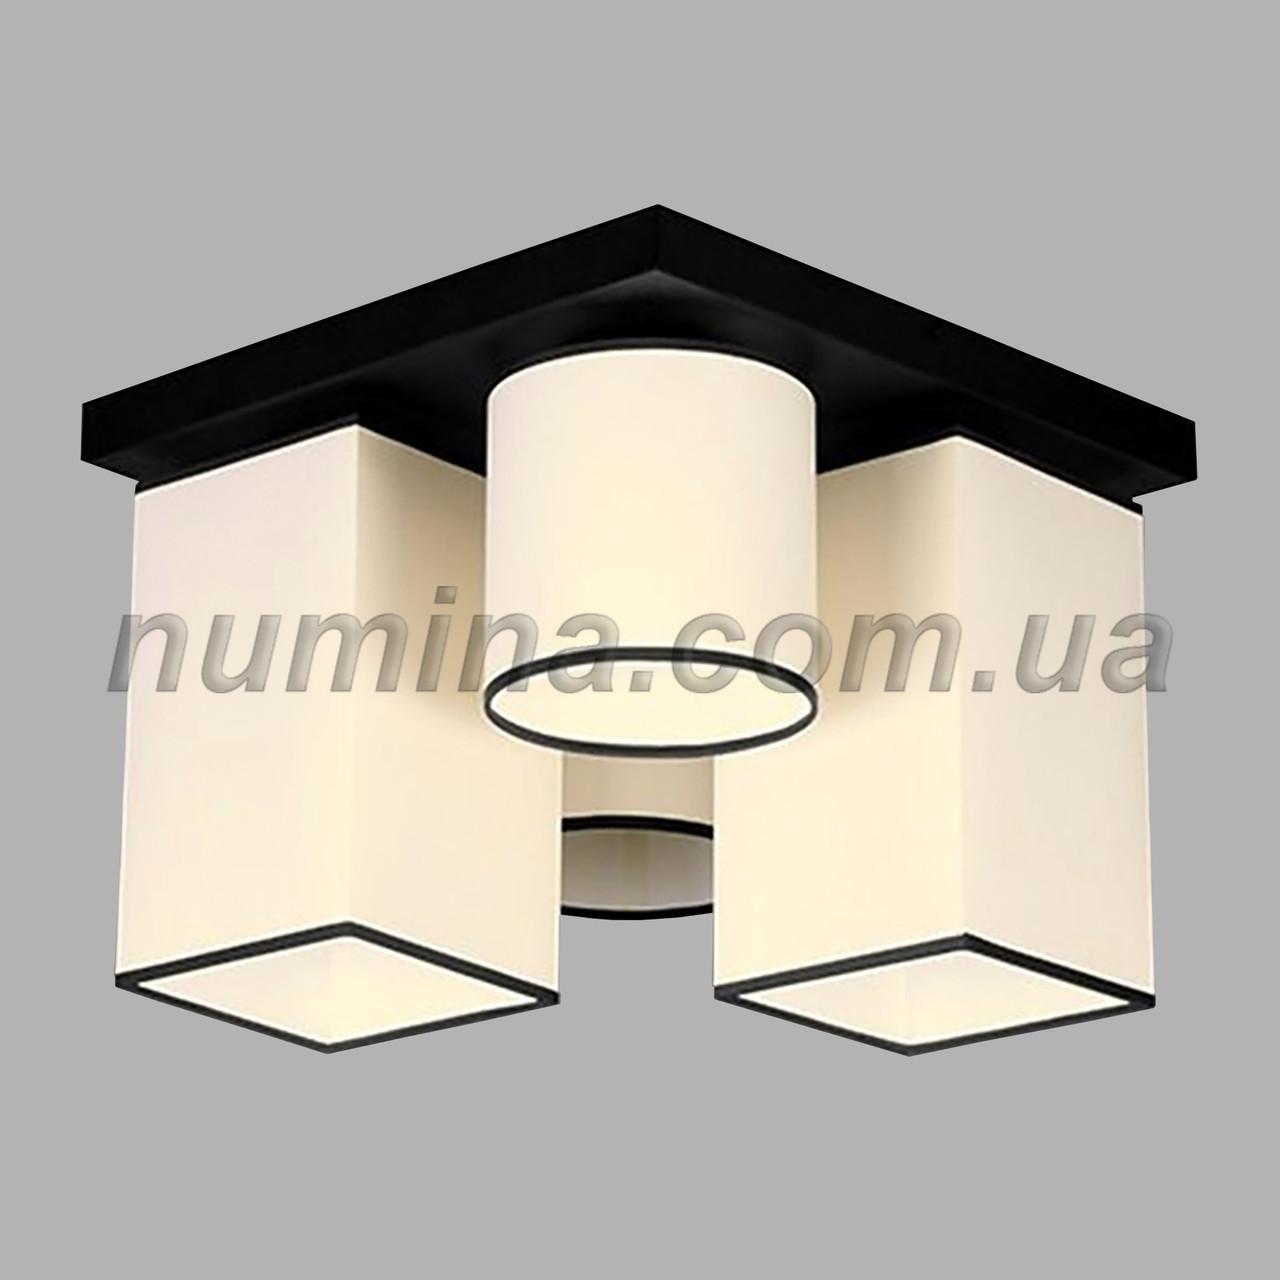 Люстра потолочная на 4 лампы 29-H178/4B BK+MIX